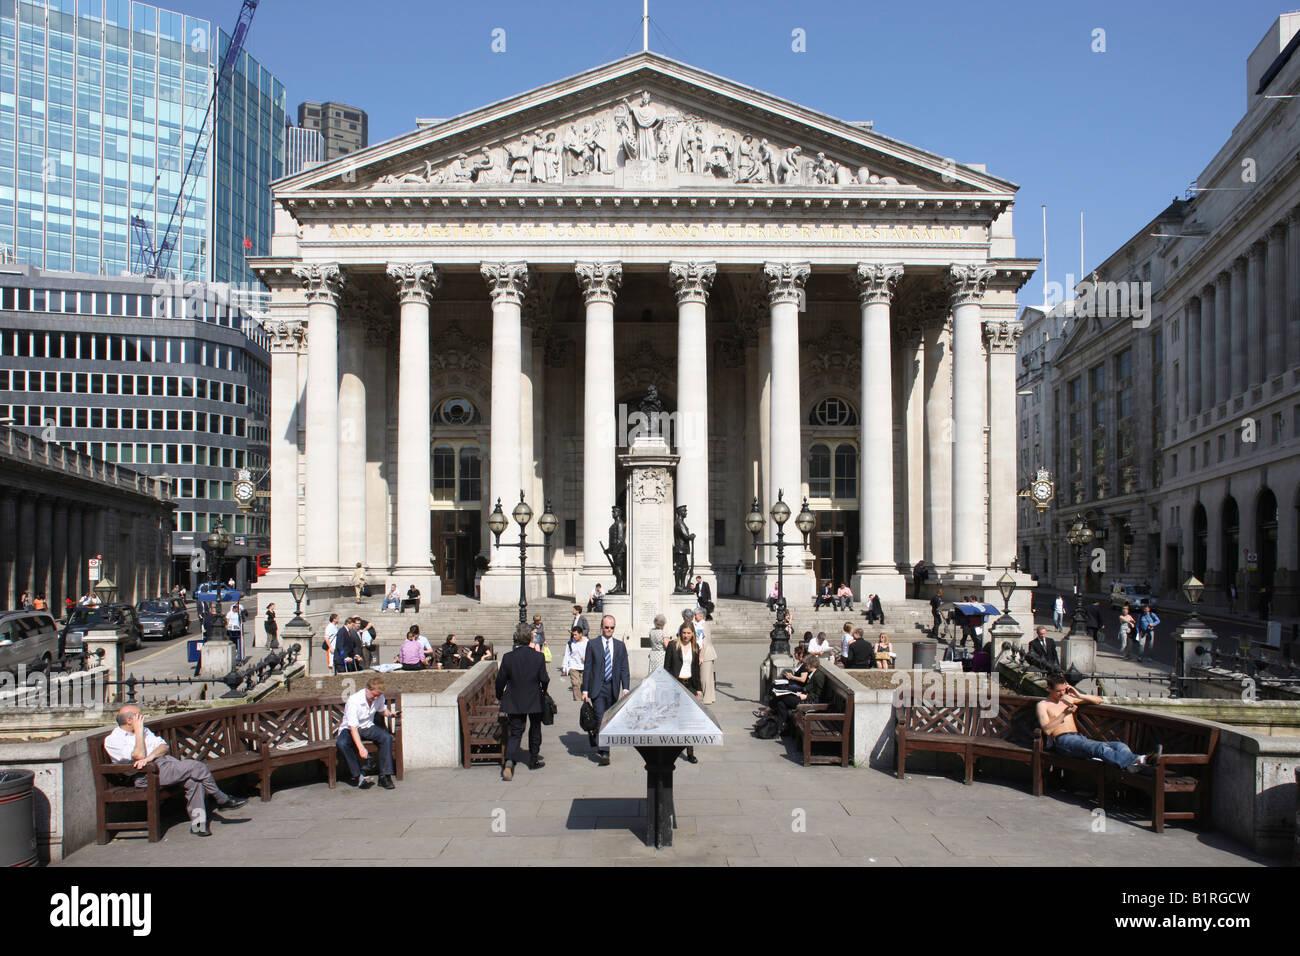 Royal Exchange, London, England, Great Britain, Europe - Stock Image